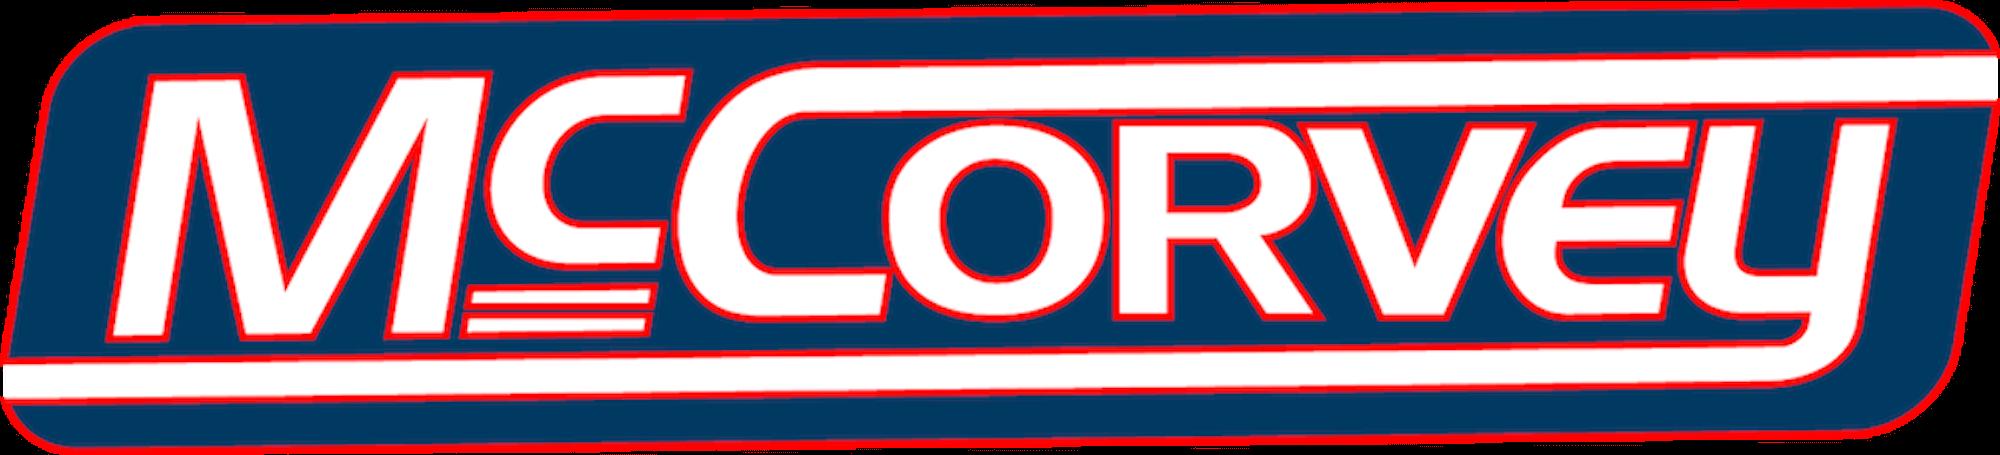 Logotipo de McCorvey